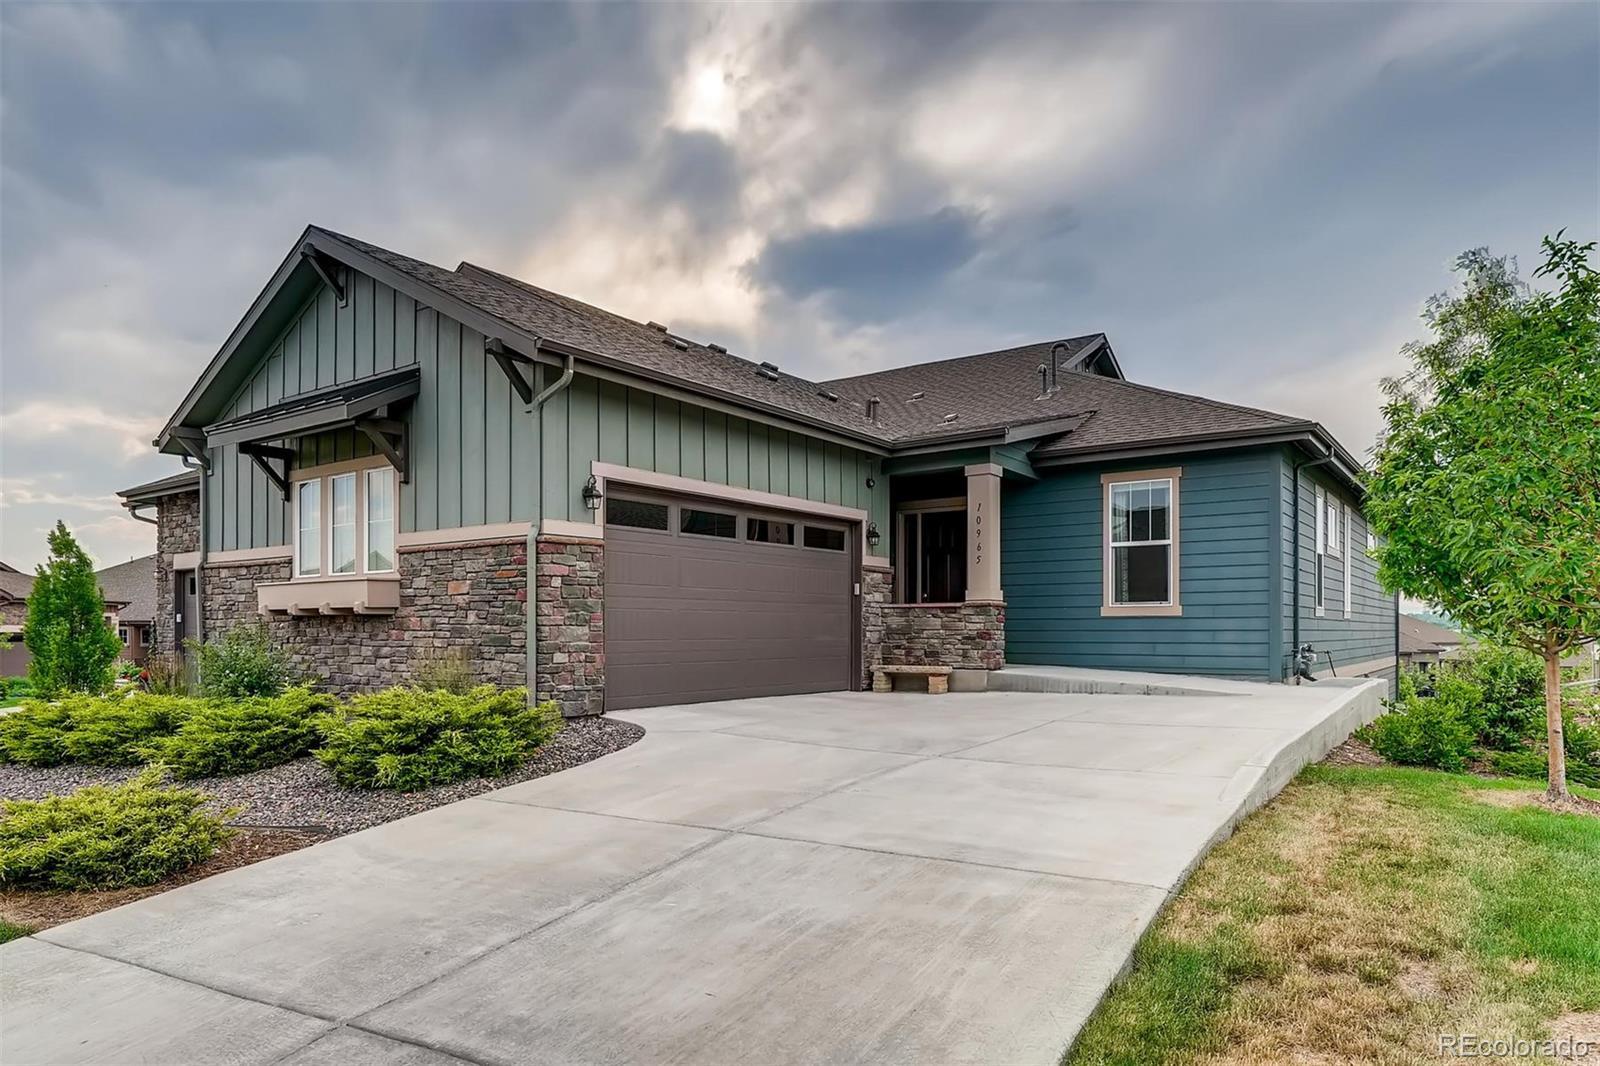 80031 Real Estate Listings Main Image